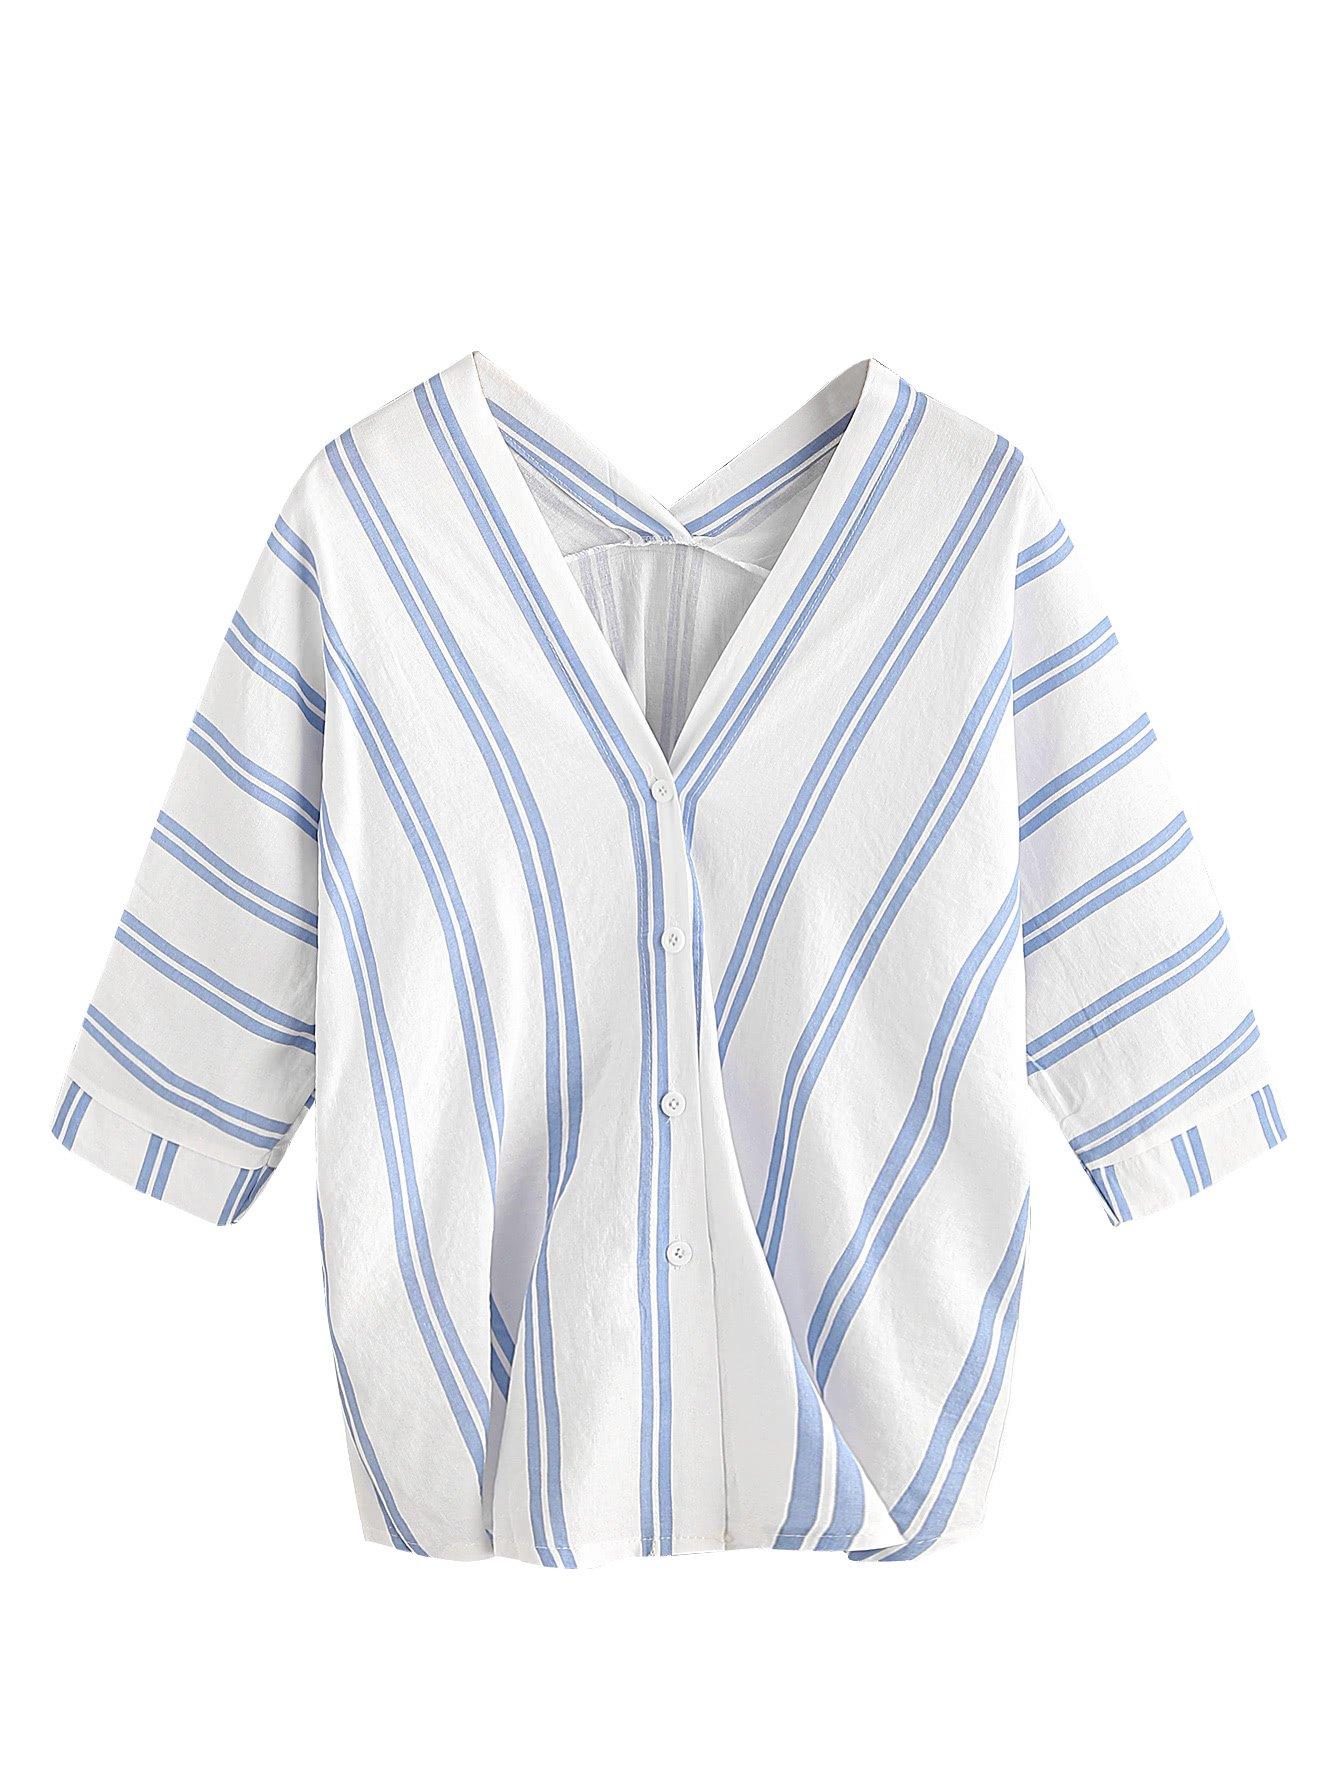 MakeMeChic 女式半袖 V 领垂直条纹夏季休闲上衣